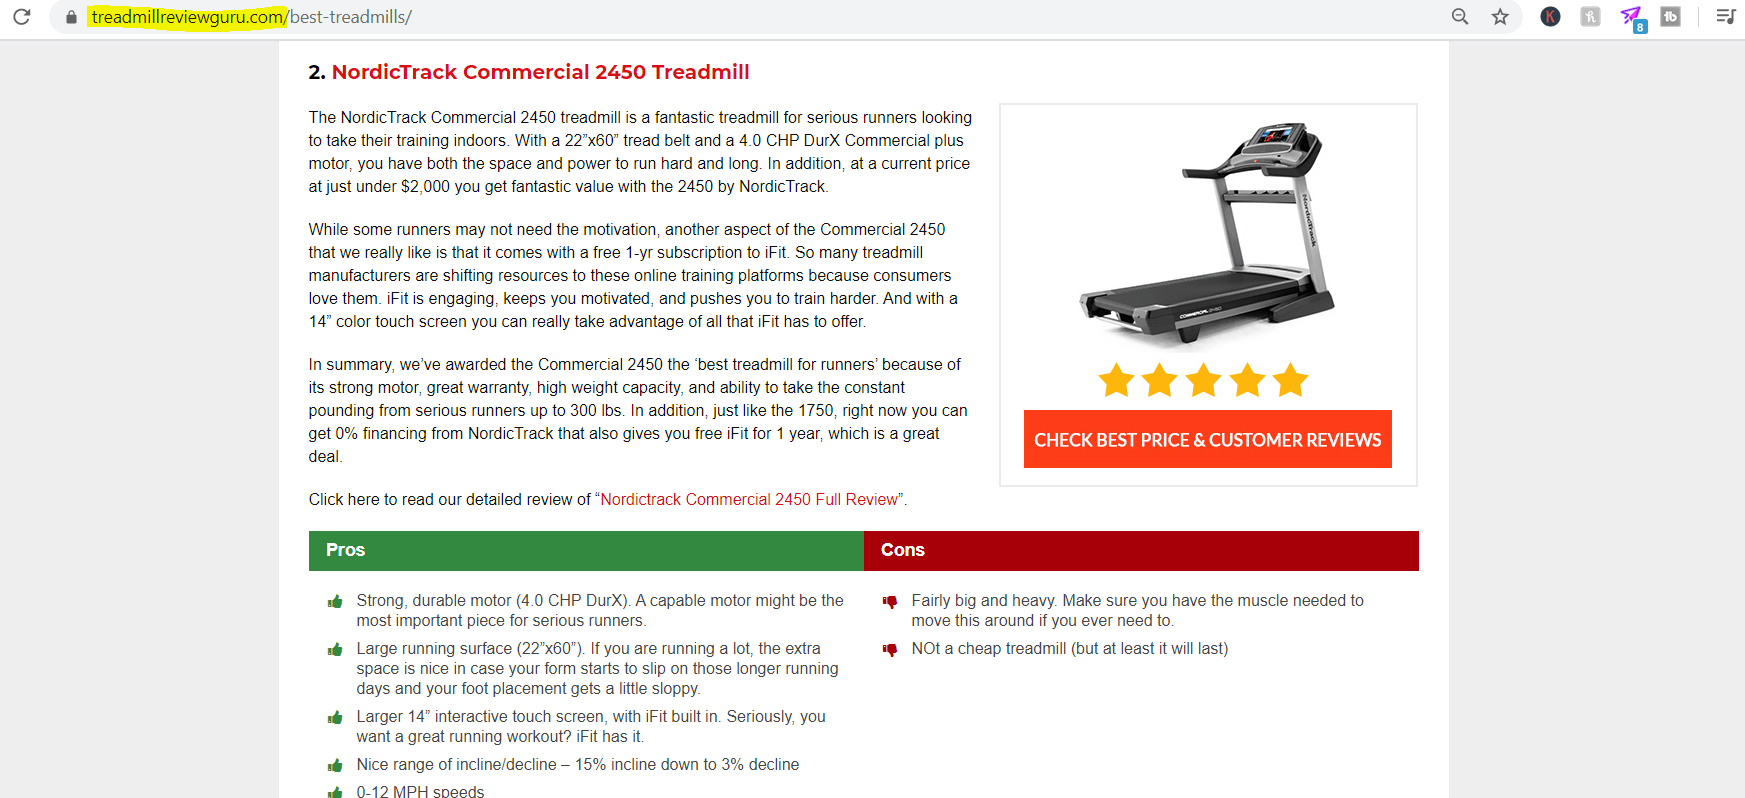 amazon-affiliate-example